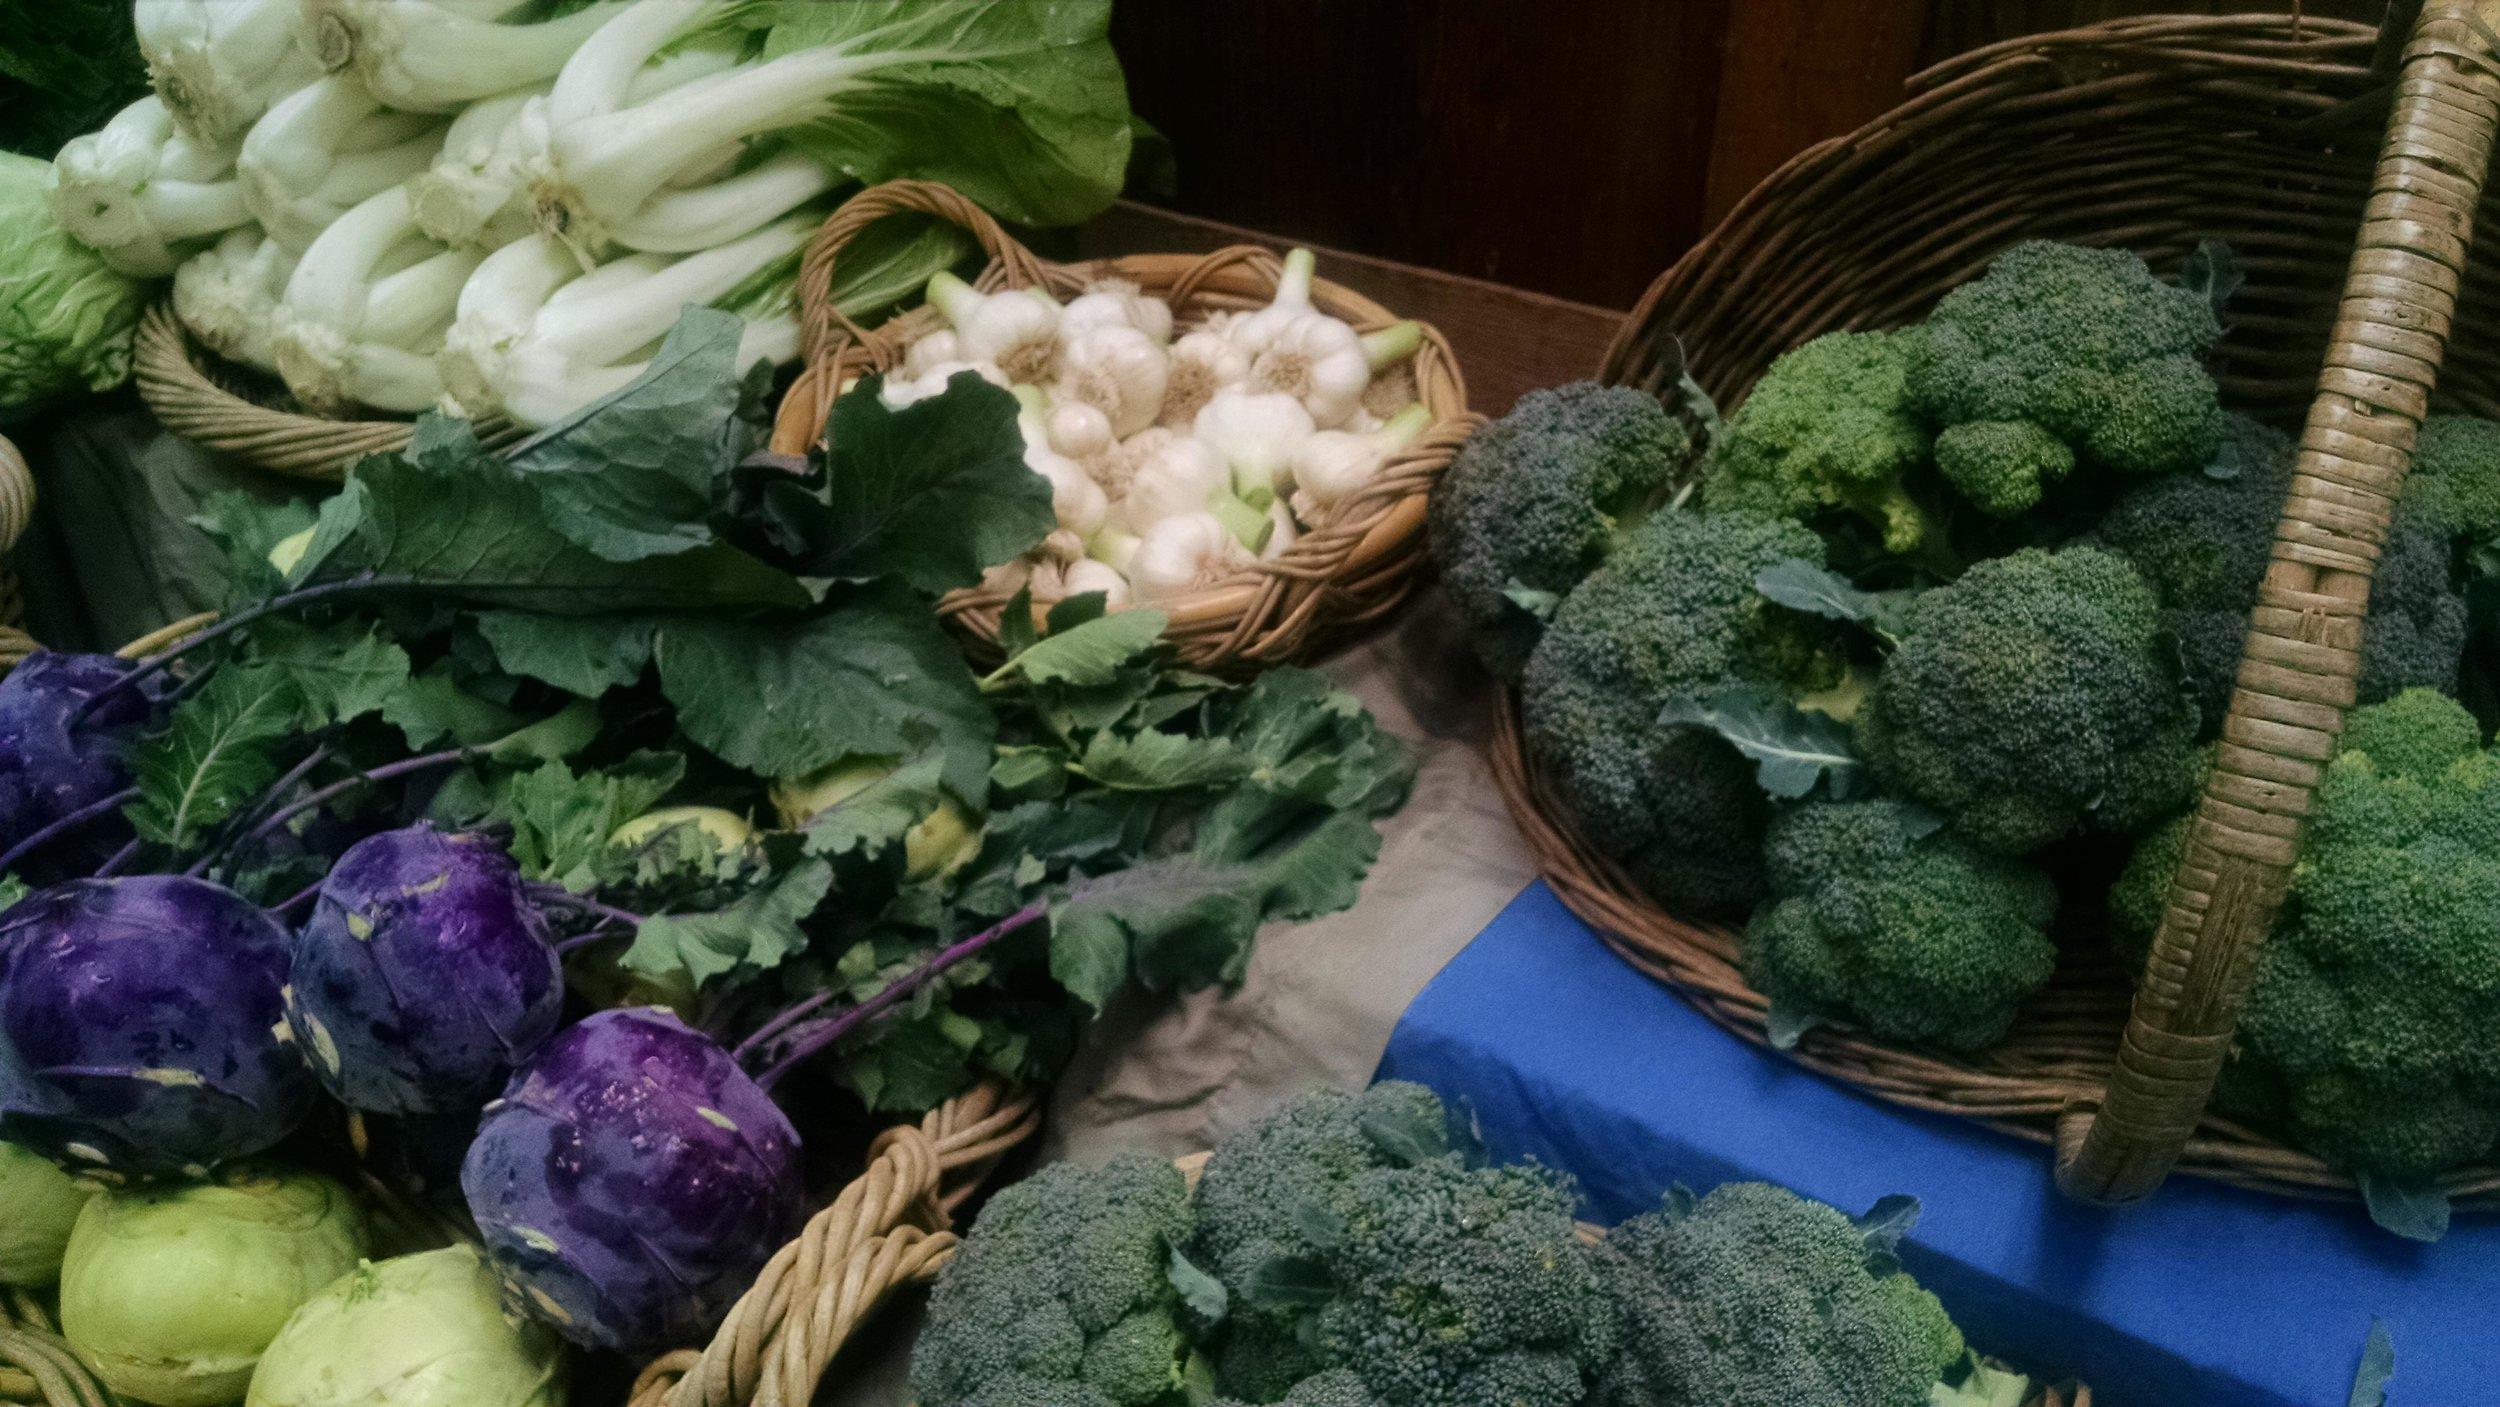 Bok choy, kohlrabi, garlic, broccoli